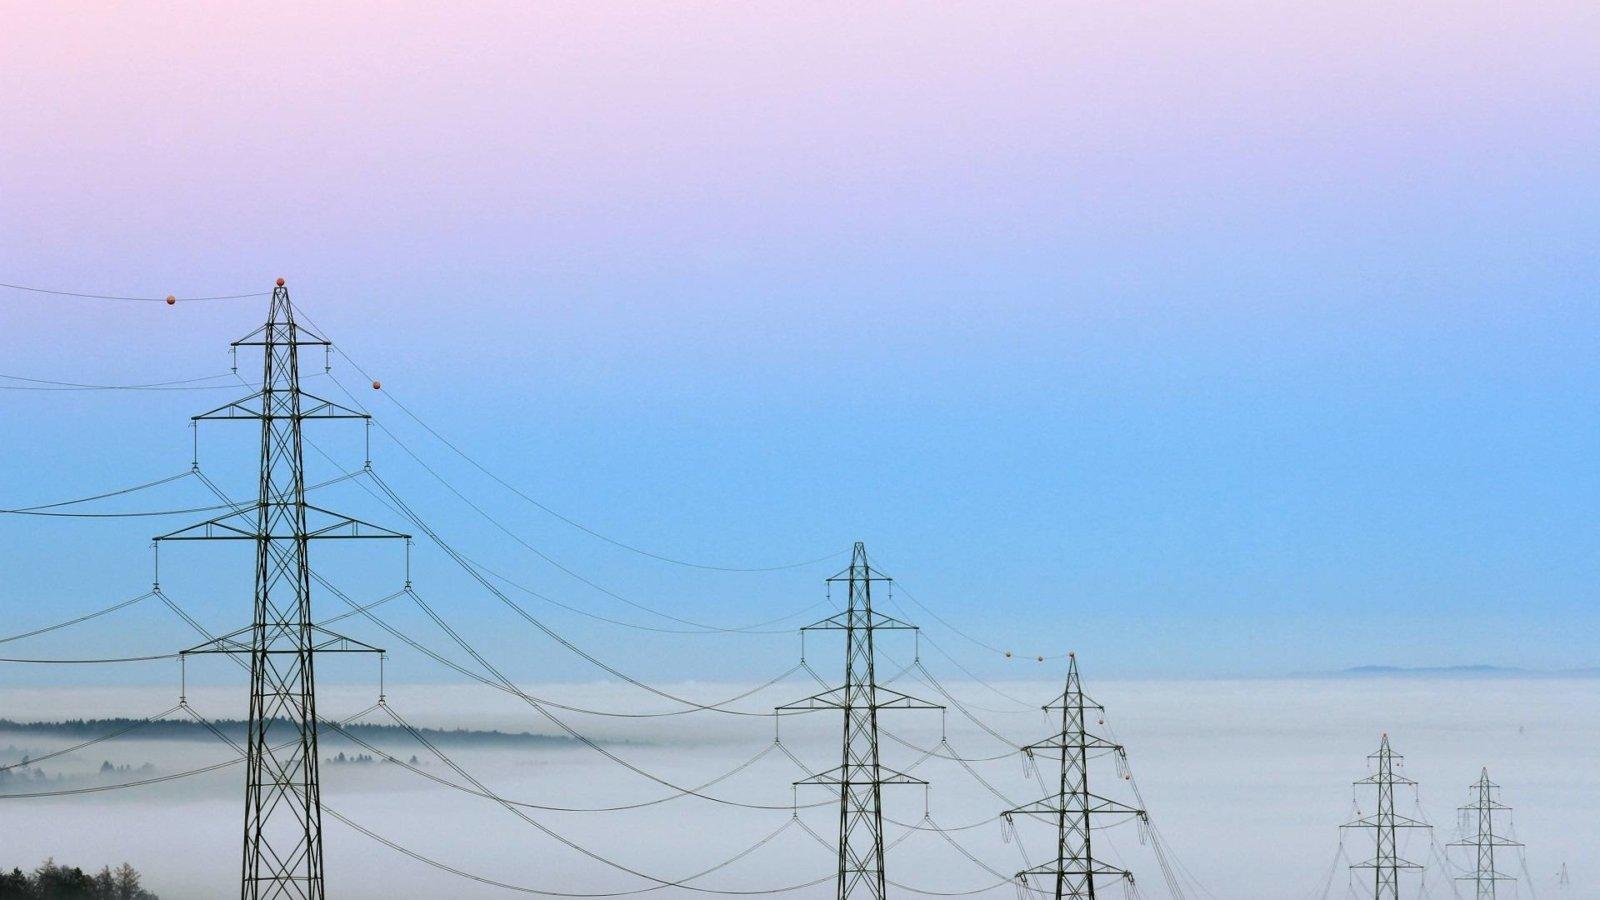 noticias-event-forum-de-energia-renovavel-2019-compressed